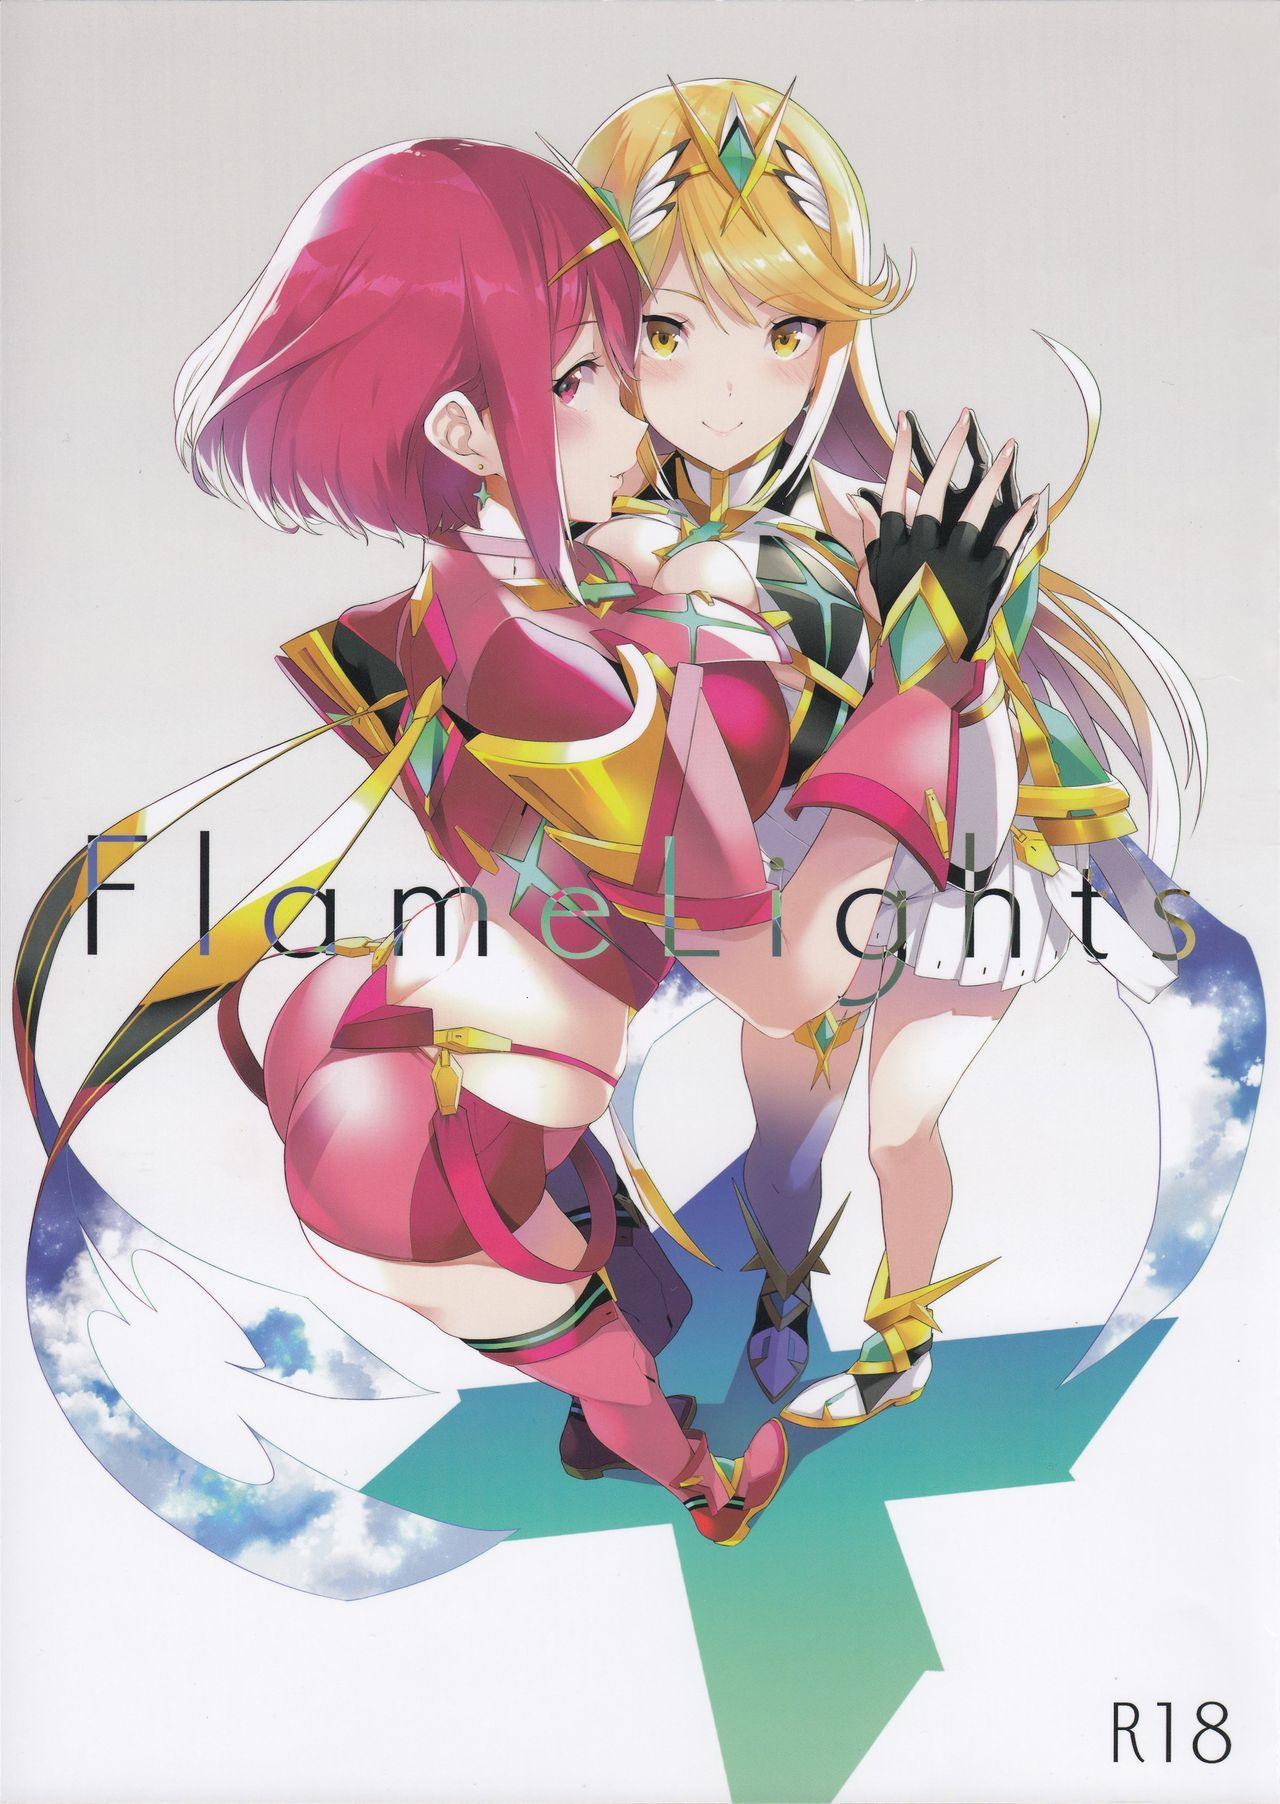 FlameLights 0